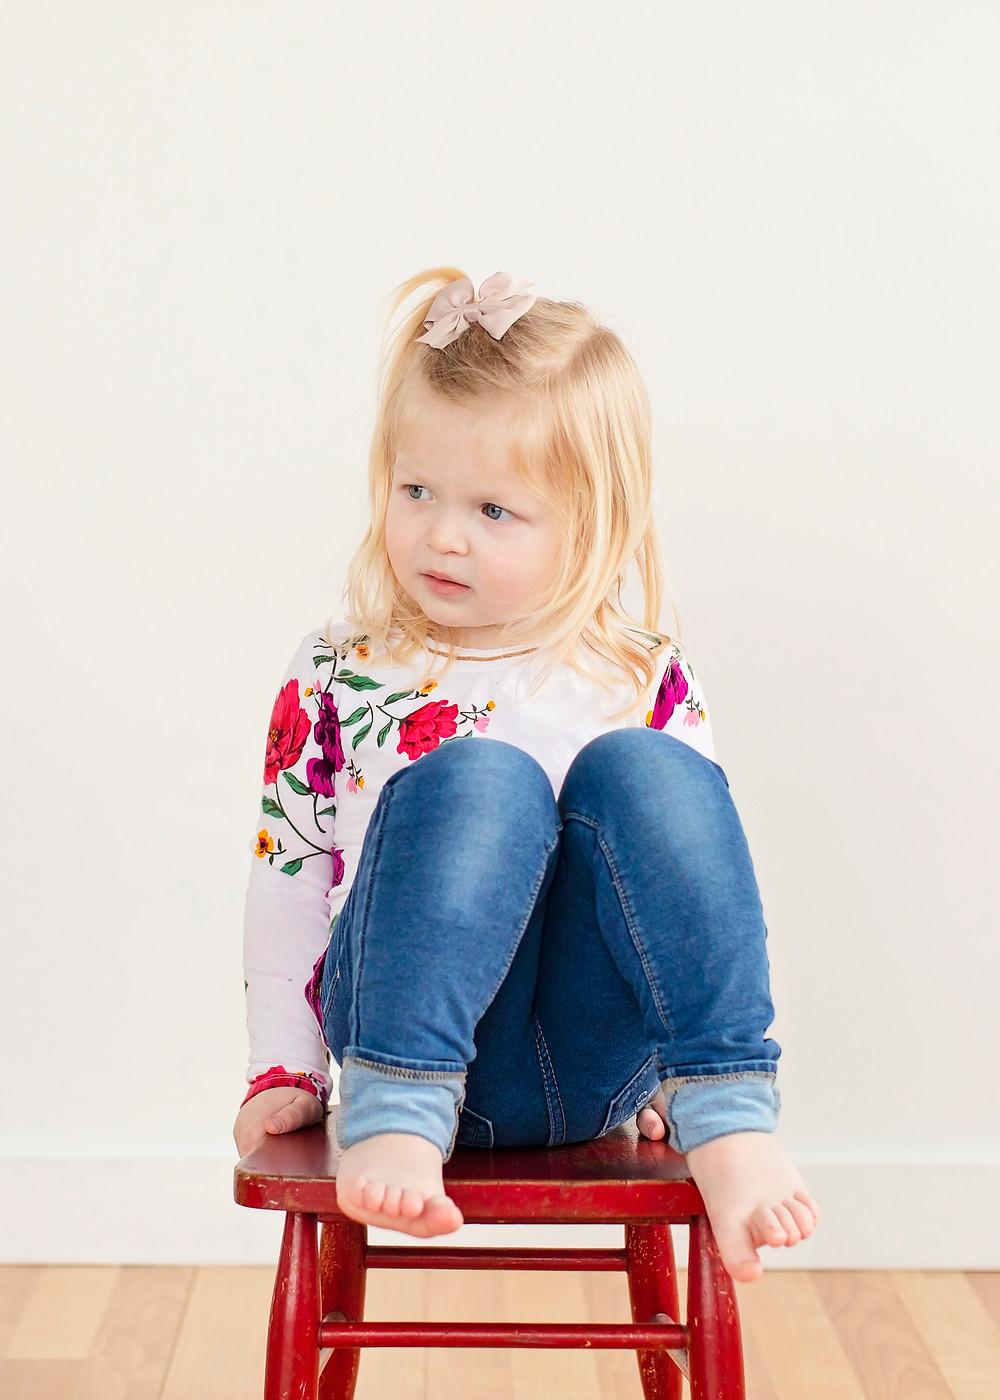 Fargo Child Photographer